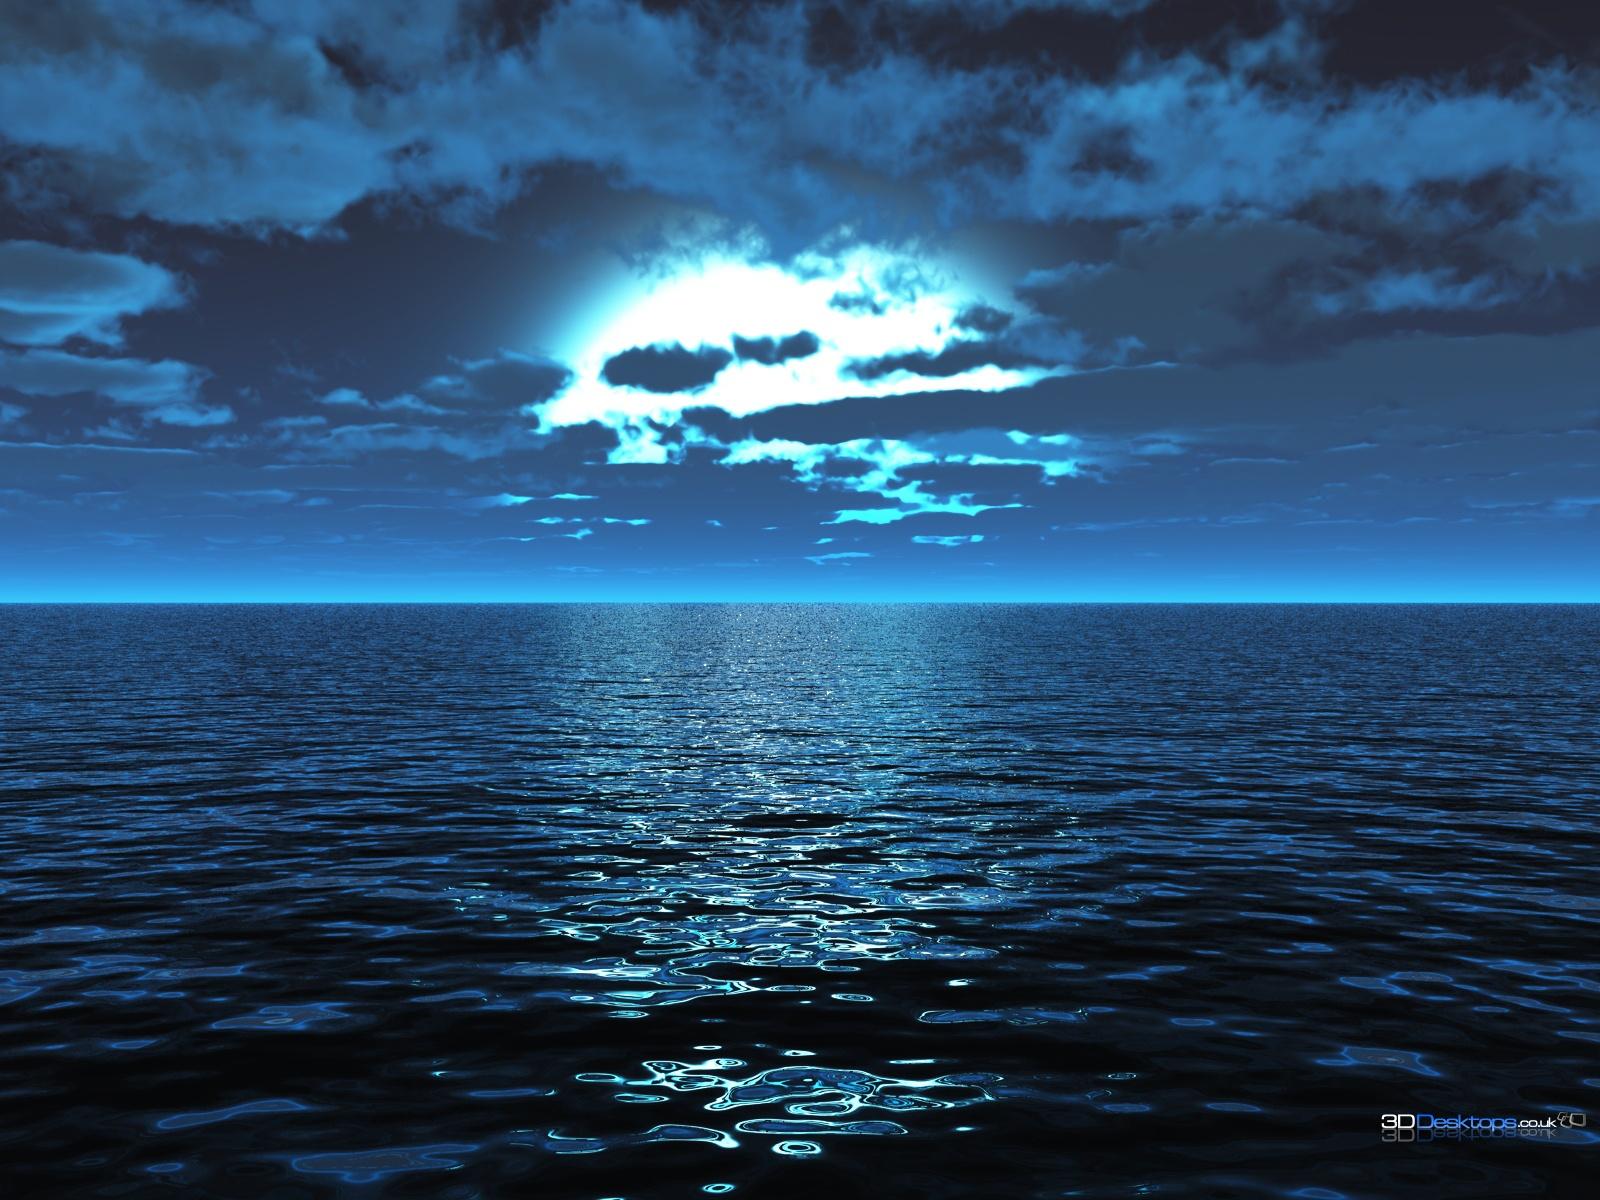 http://4.bp.blogspot.com/-UhPd7h30z2c/TwwFDd1lEkI/AAAAAAAADIc/q2bktfs6Ku8/s1600/3d_wallpaper_ocean-1600x1200.jpg